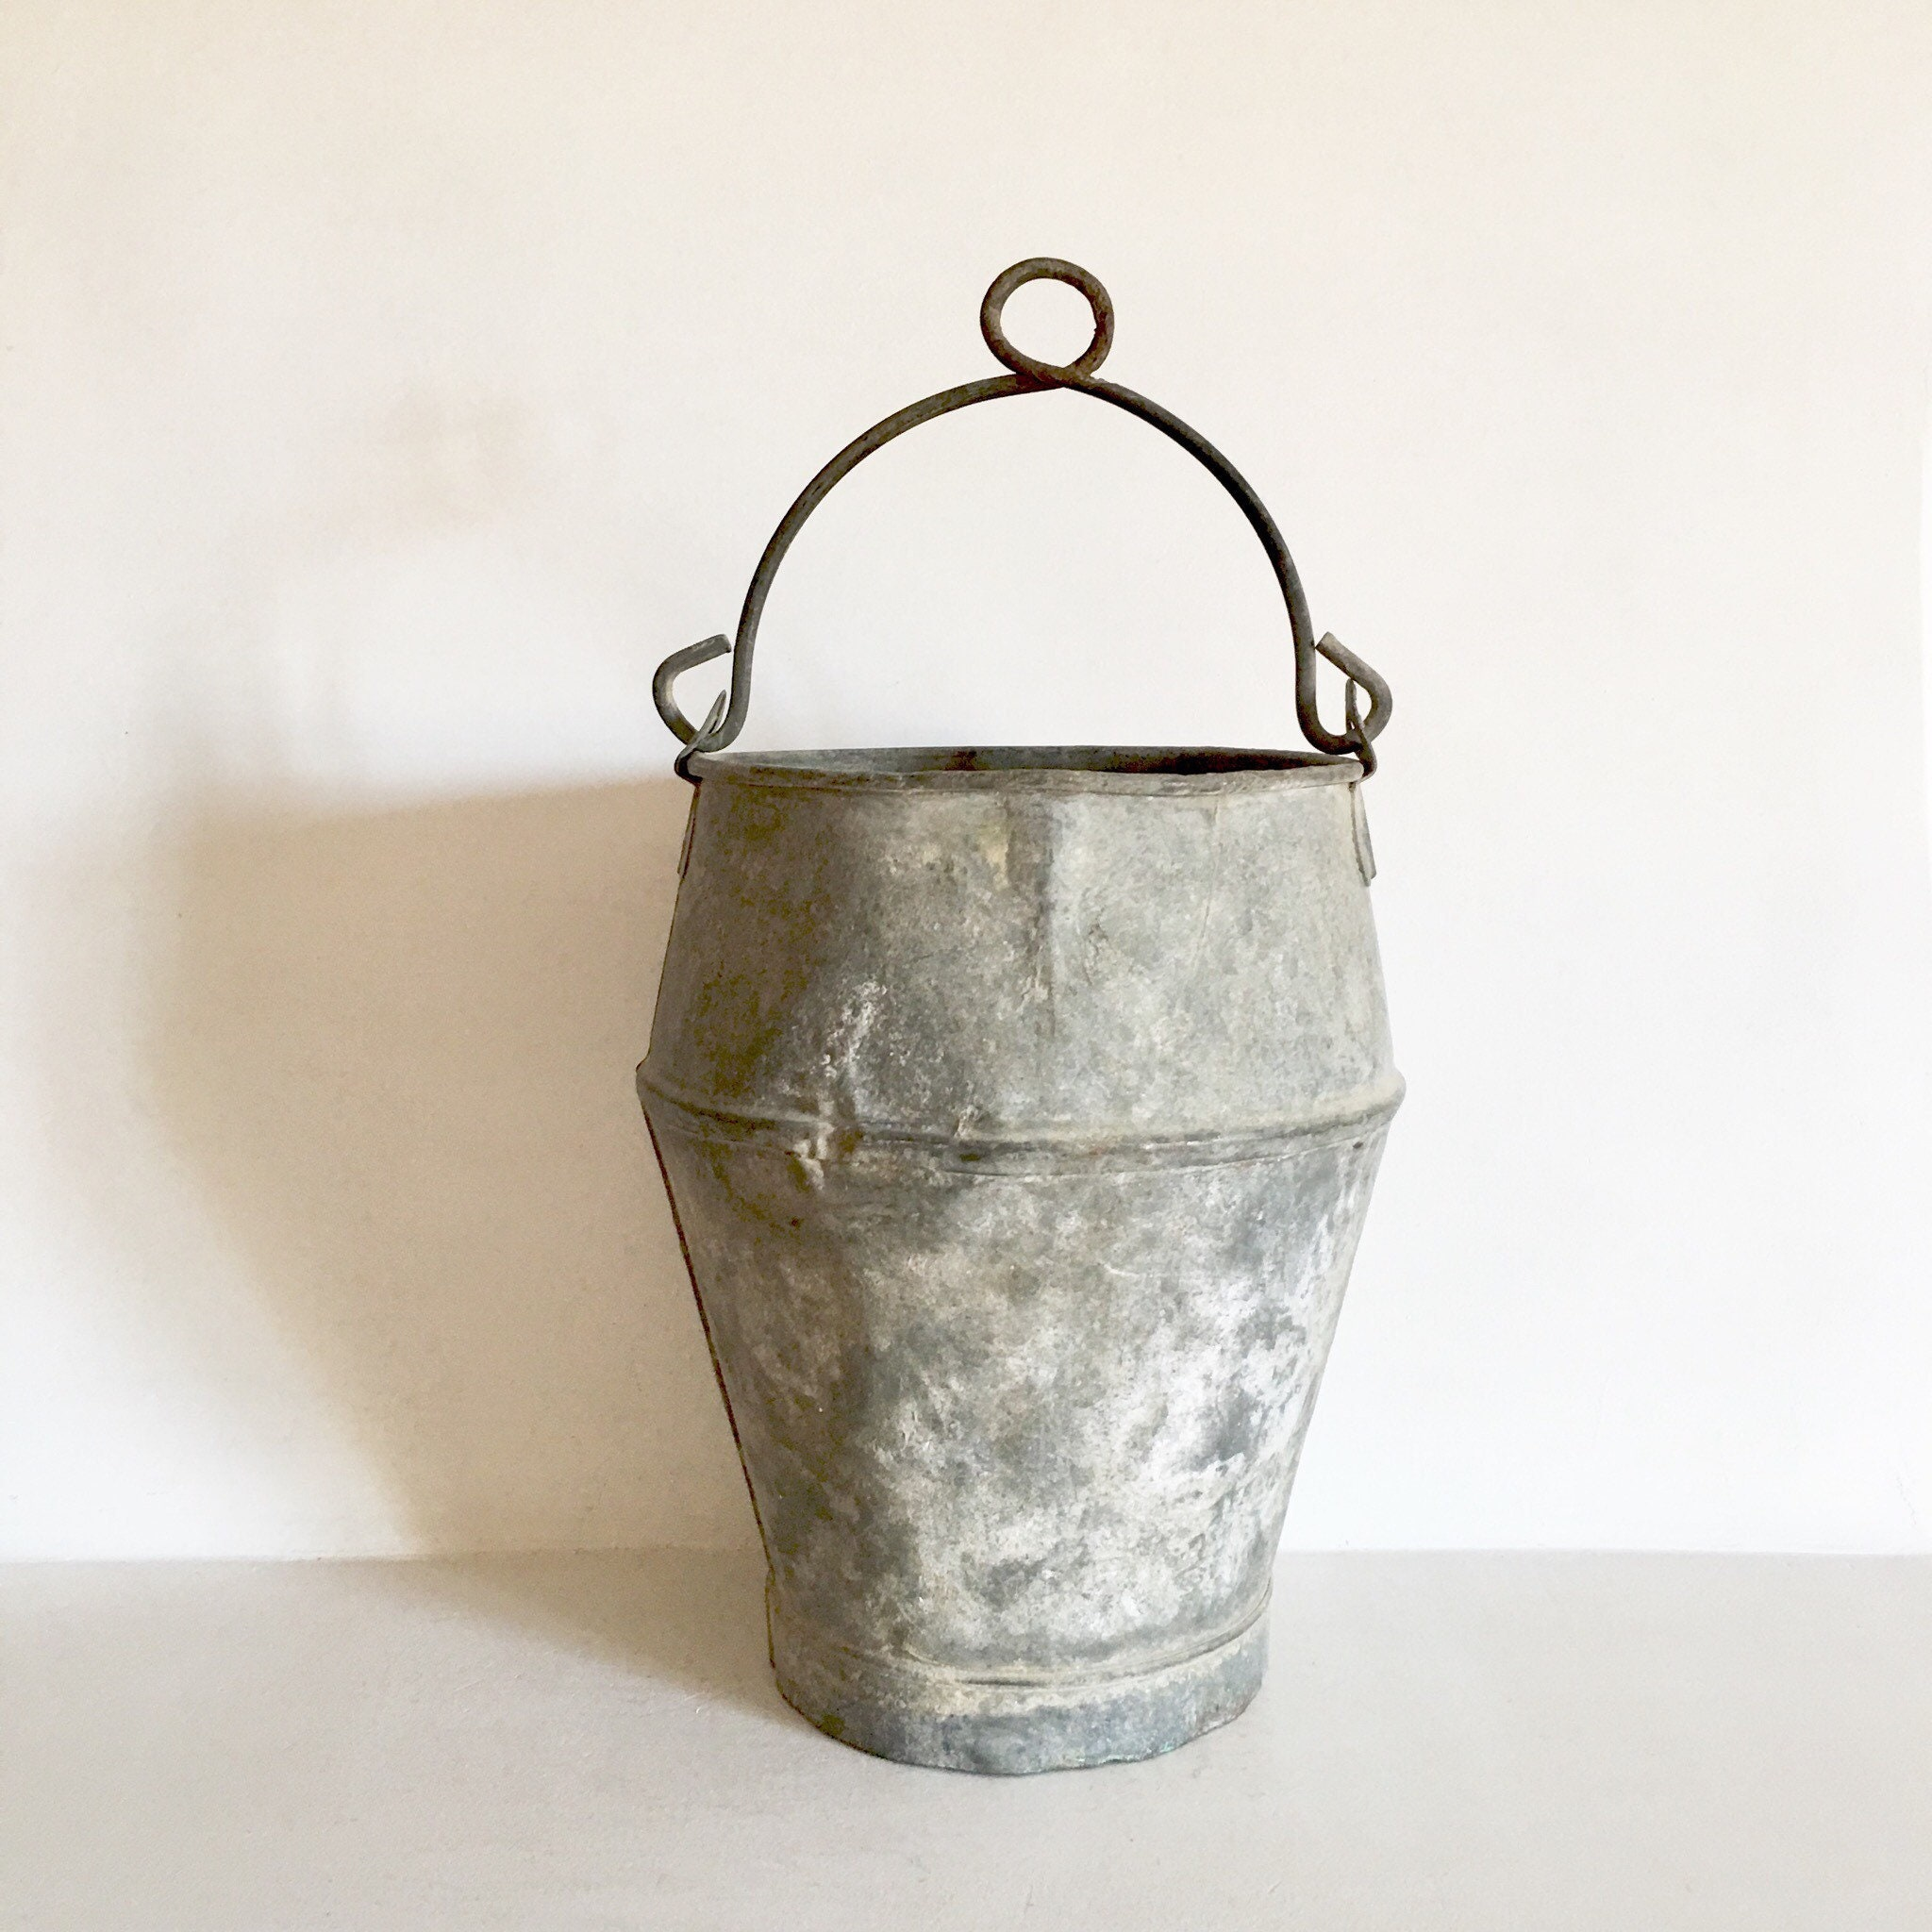 French Antique Zinc Bucket   Shabby Chic Garden Bucket   Milking Bucket    Well Bucket   French Country Garden Decor   Fabulous Patina